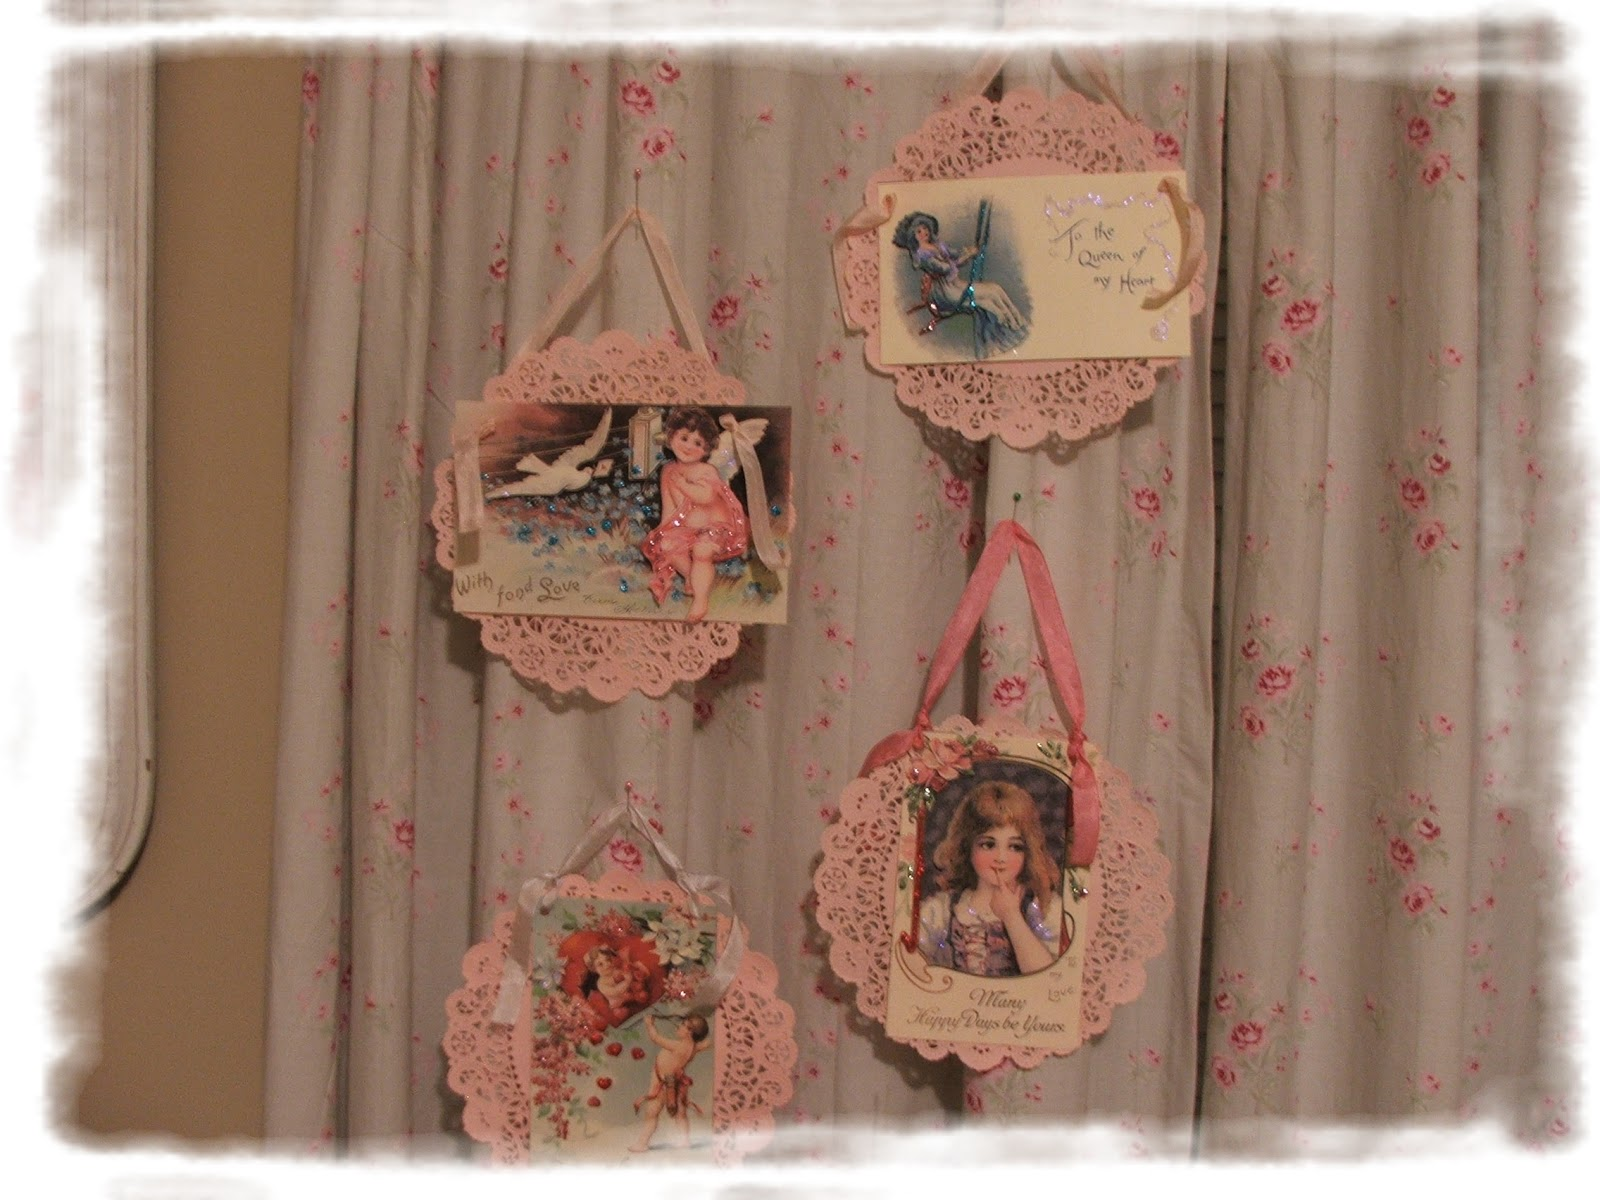 http://3.bp.blogspot.com/_CjquEOBtV2Q/TTrbe_JRyoI/AAAAAAAAAog/LfCSIwaKZq0/s1600/valentines.jpg